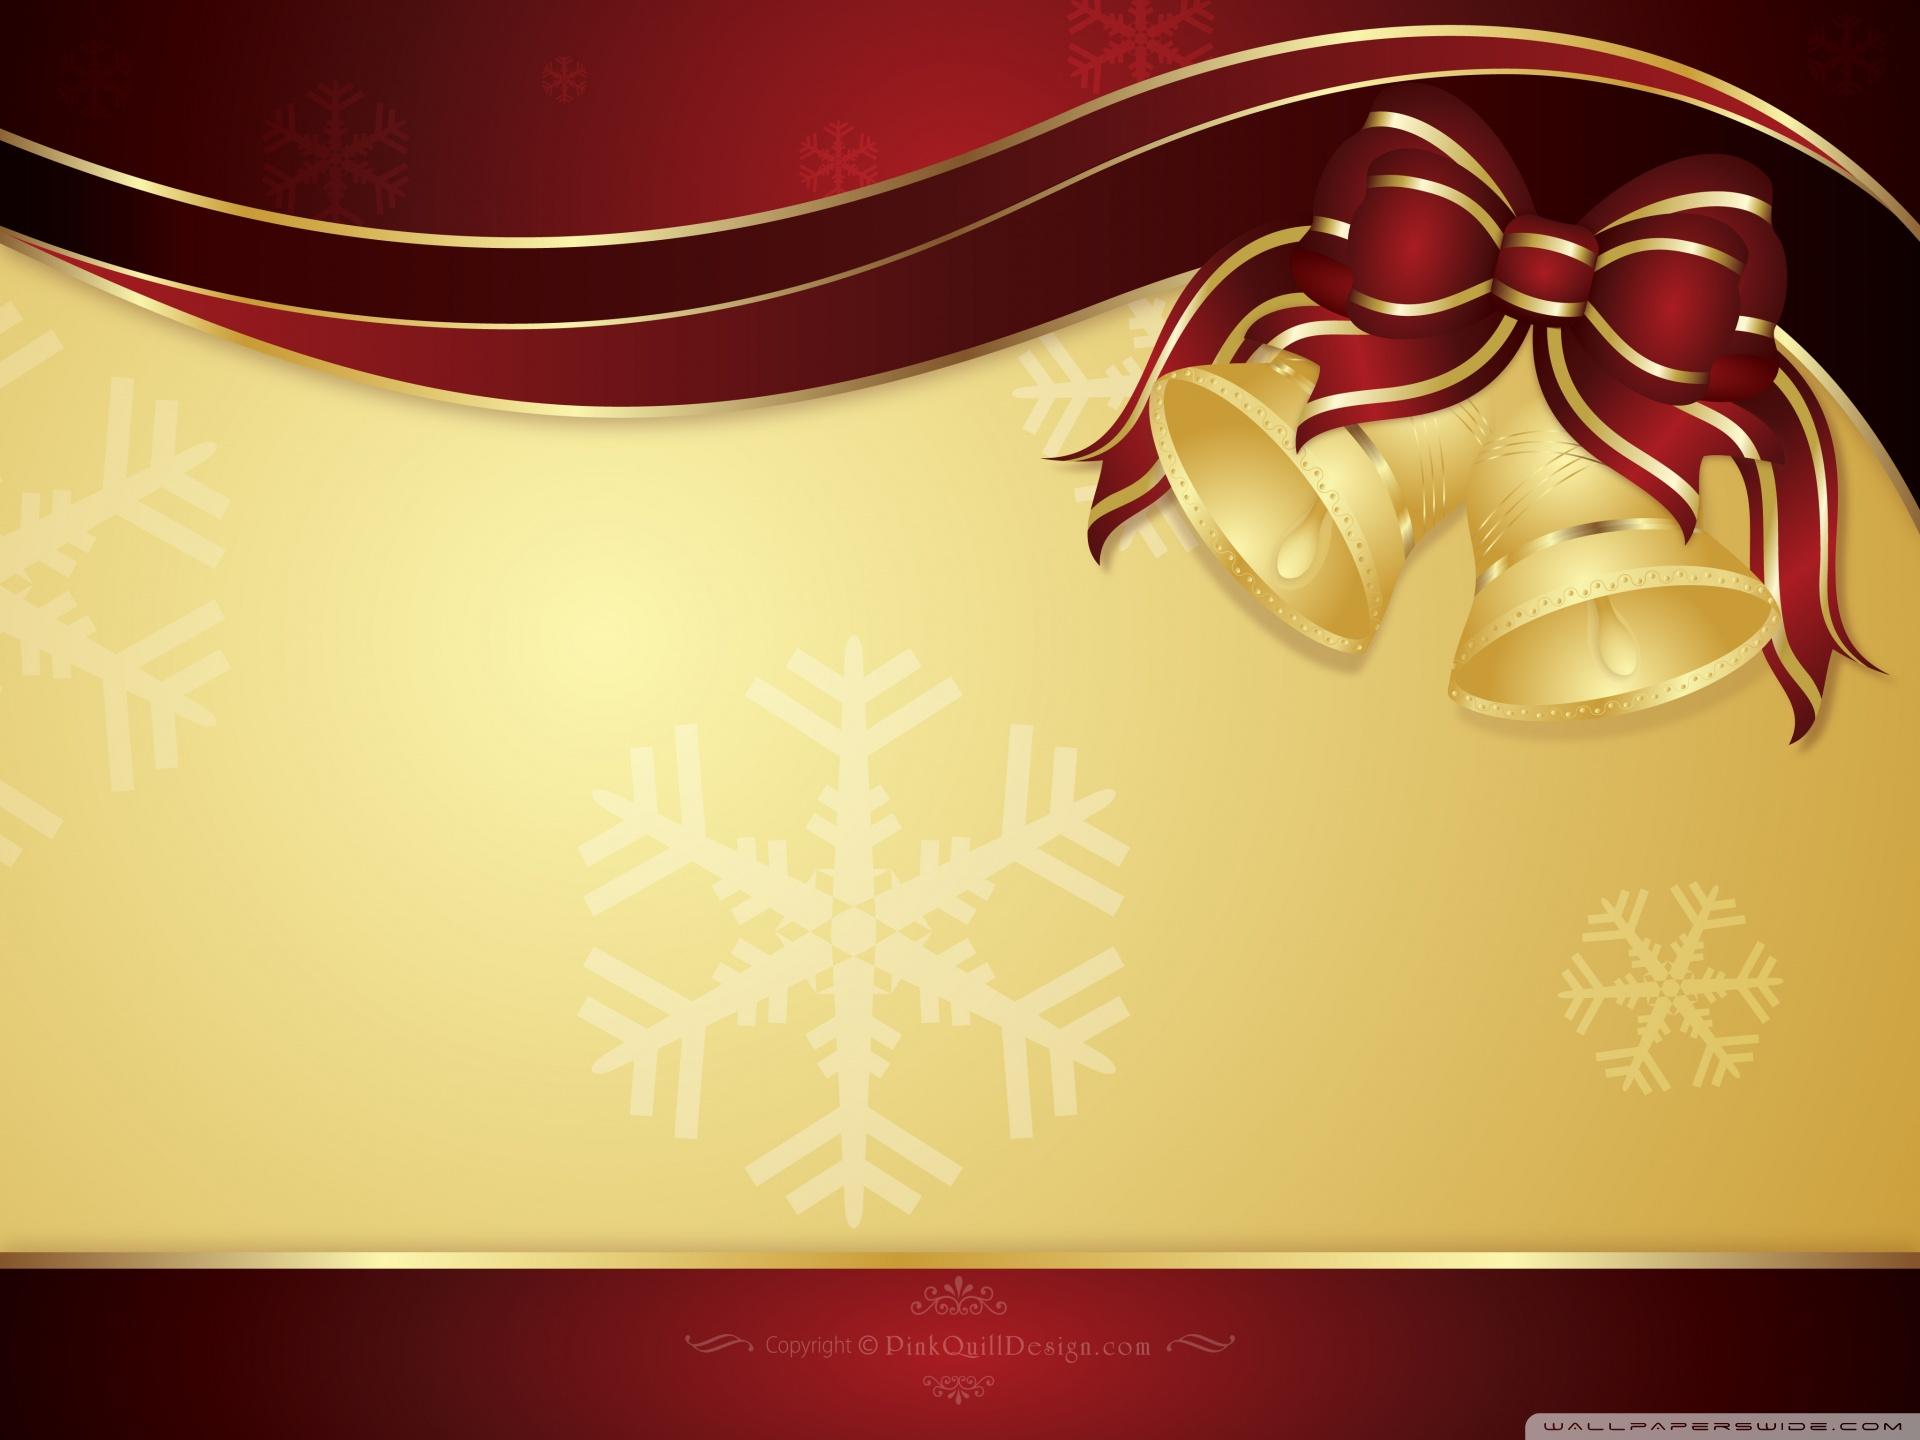 Best 59 Jingle Bells Backgrounds on HipWallpaper Xmas Jingle 1920x1440